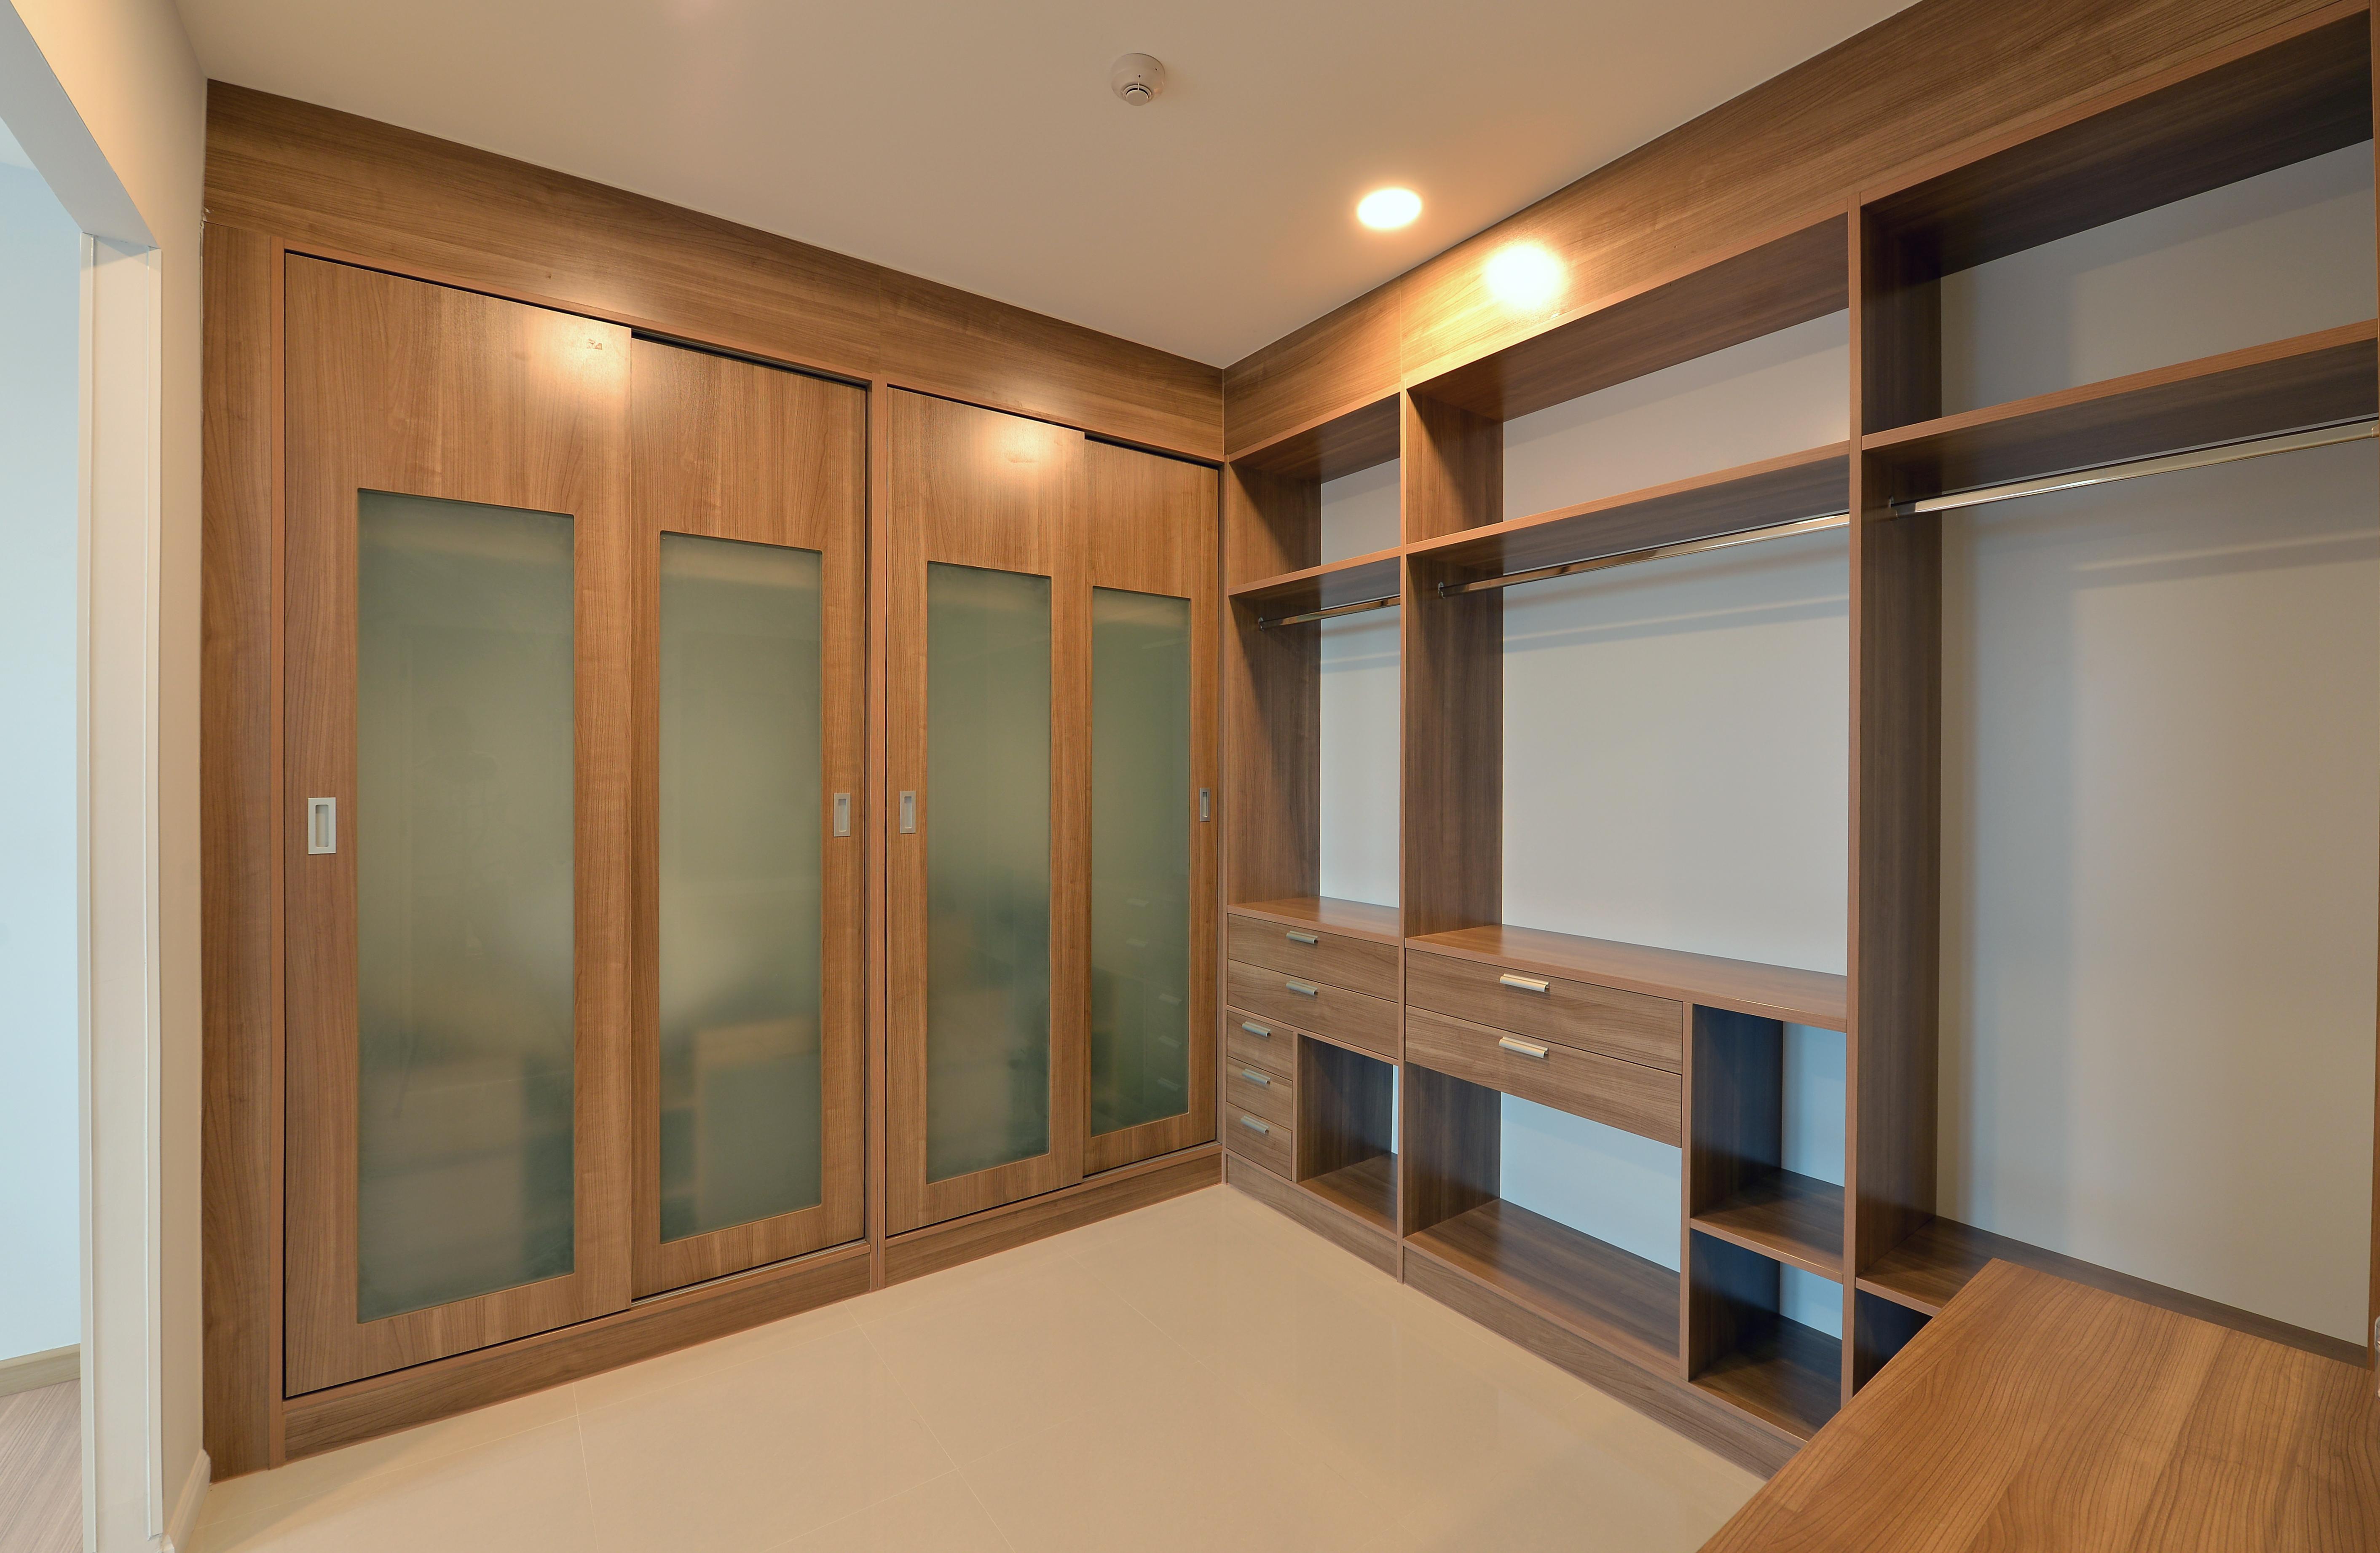 Perfecte Kamer Inloopkast : Keukens badkamermeubels inloopkasten vloeren optica design